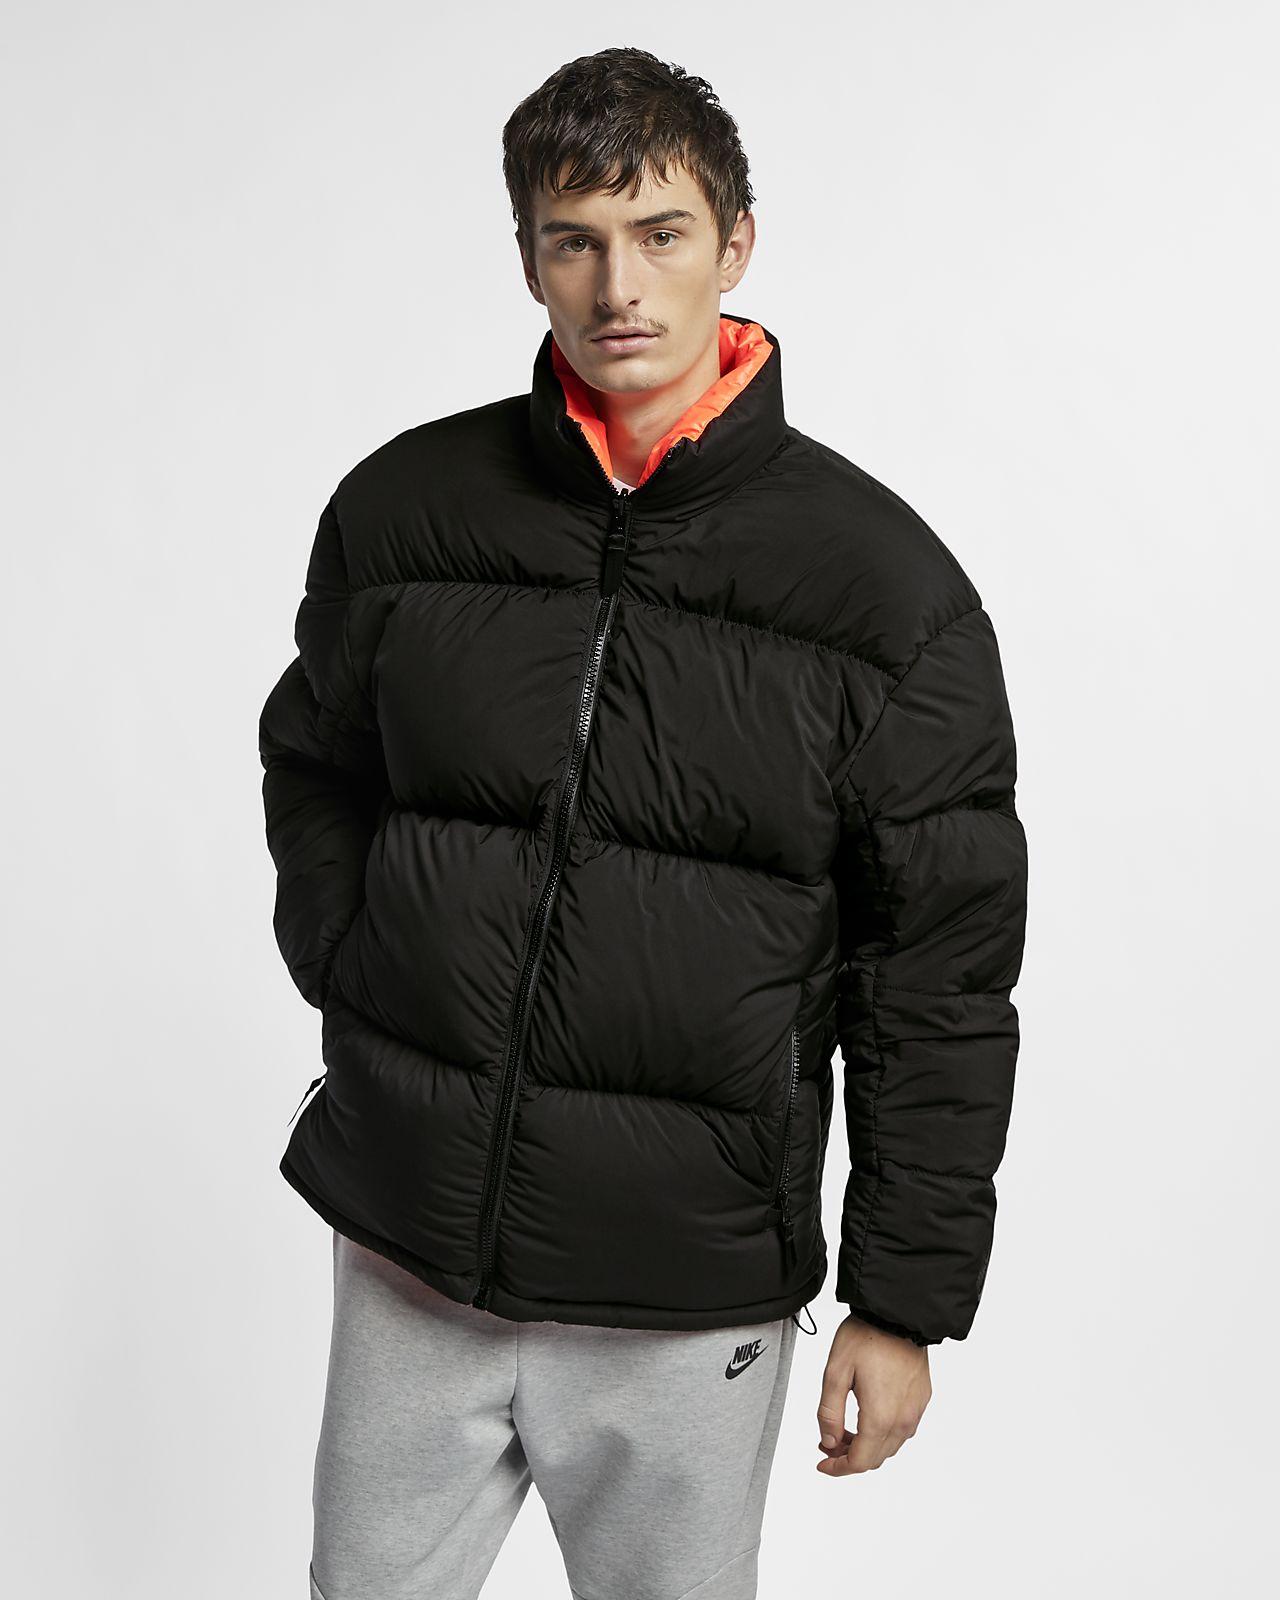 NikeLab Collection Men s Puffer Jacket. Nike.com dfb96752f